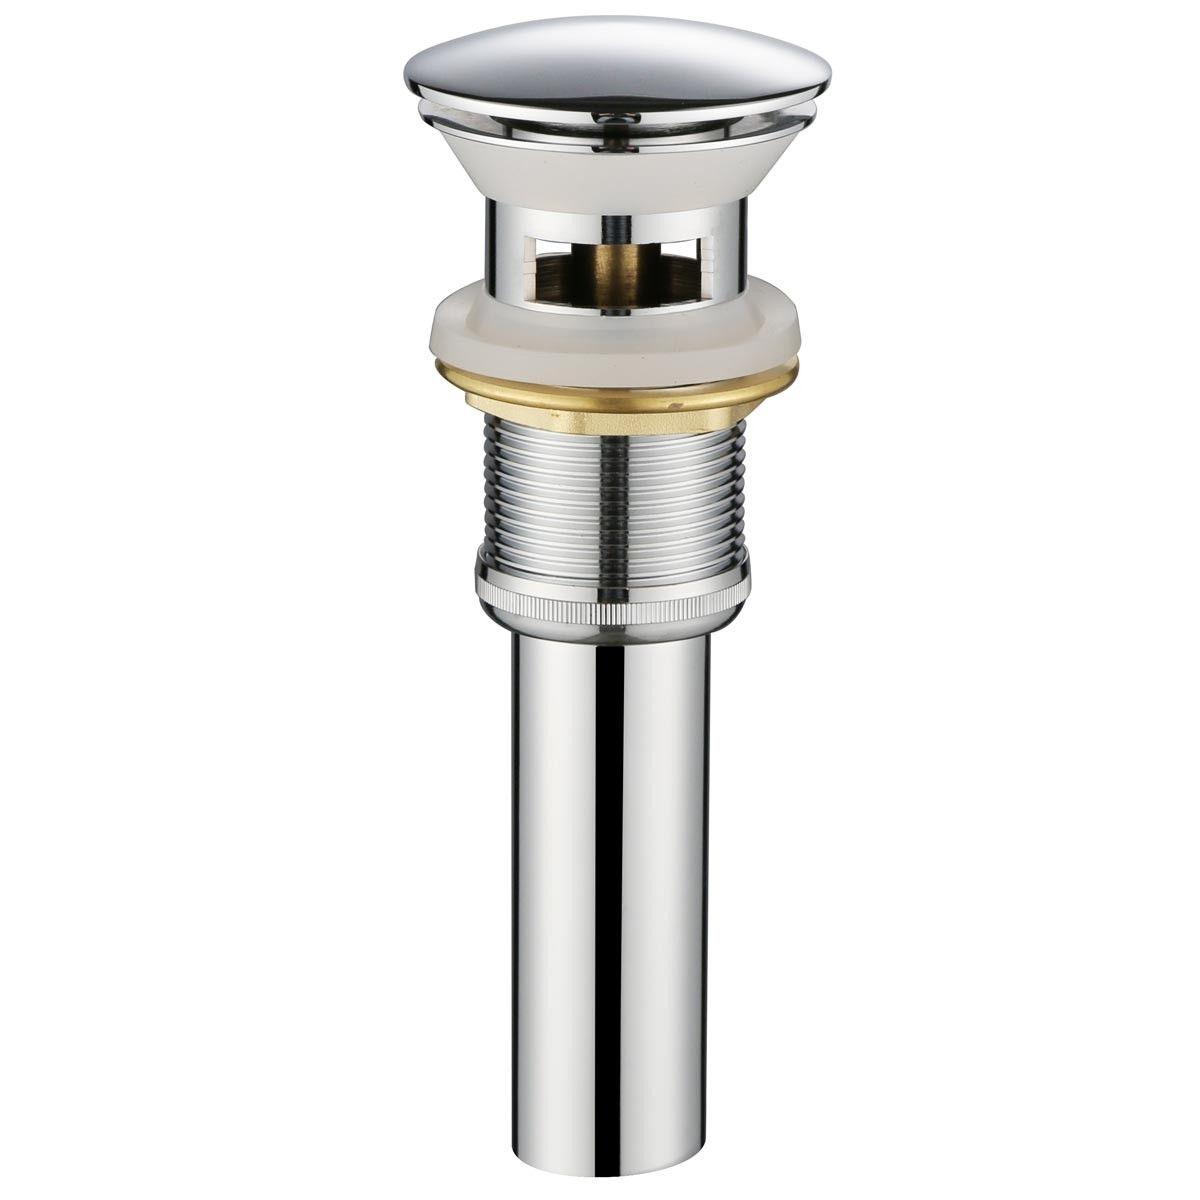 Brass Pop-Up Sink Drain (P317B)